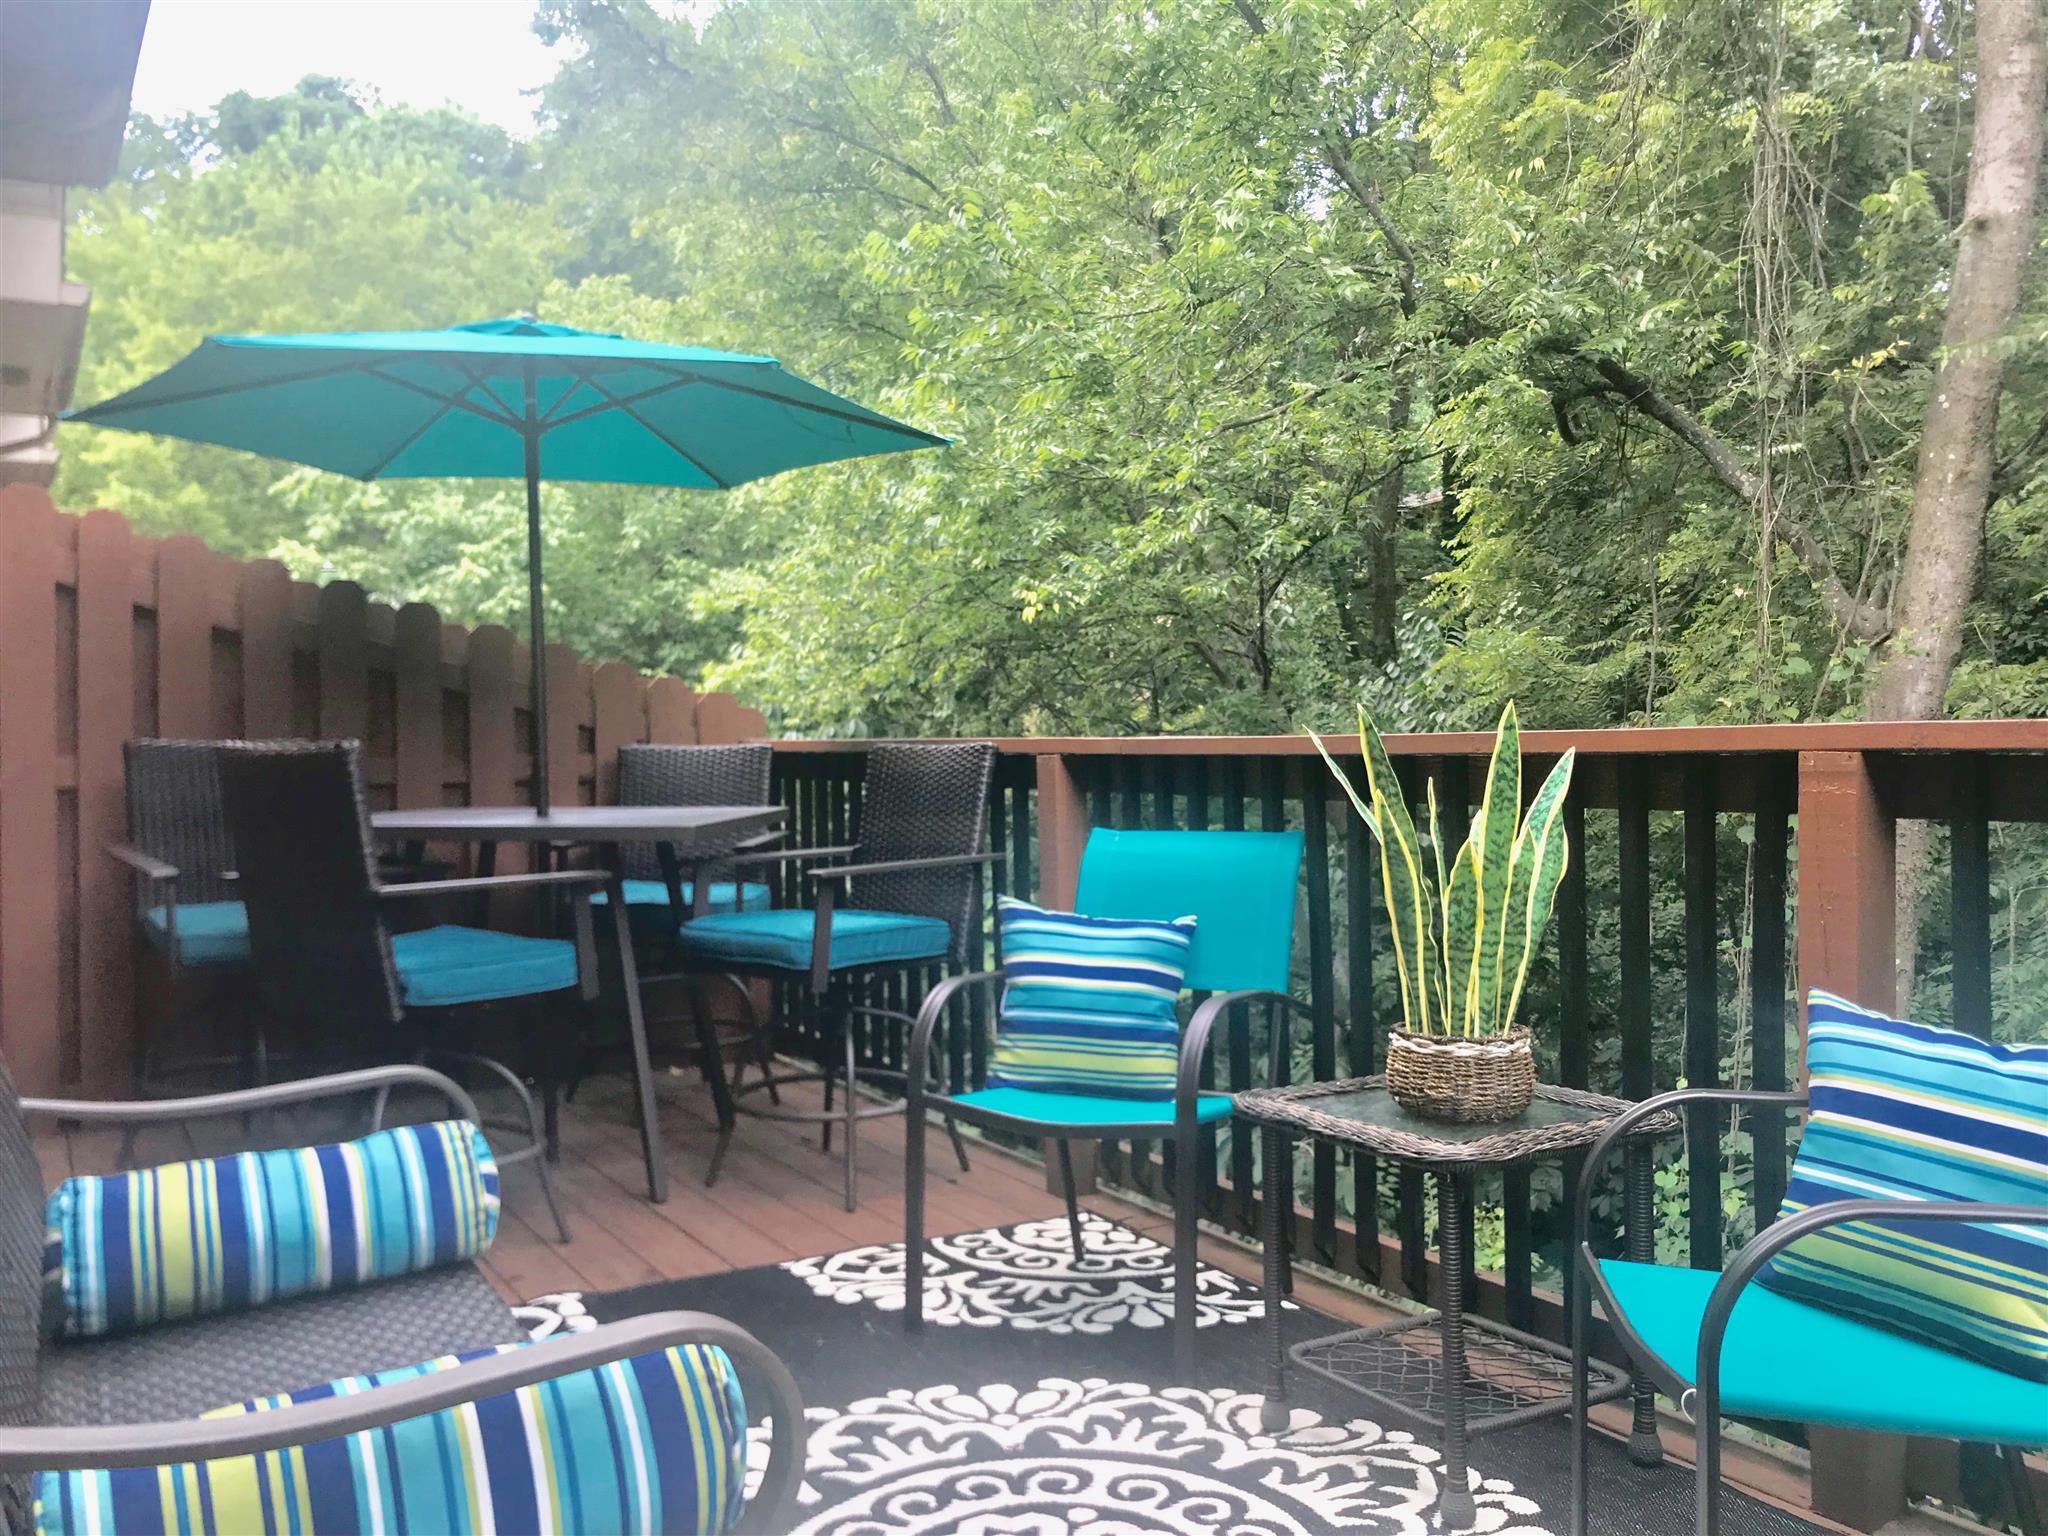 309 Riverstone Blvd., Nashville, TN 37214 - Nashville, TN real estate listing